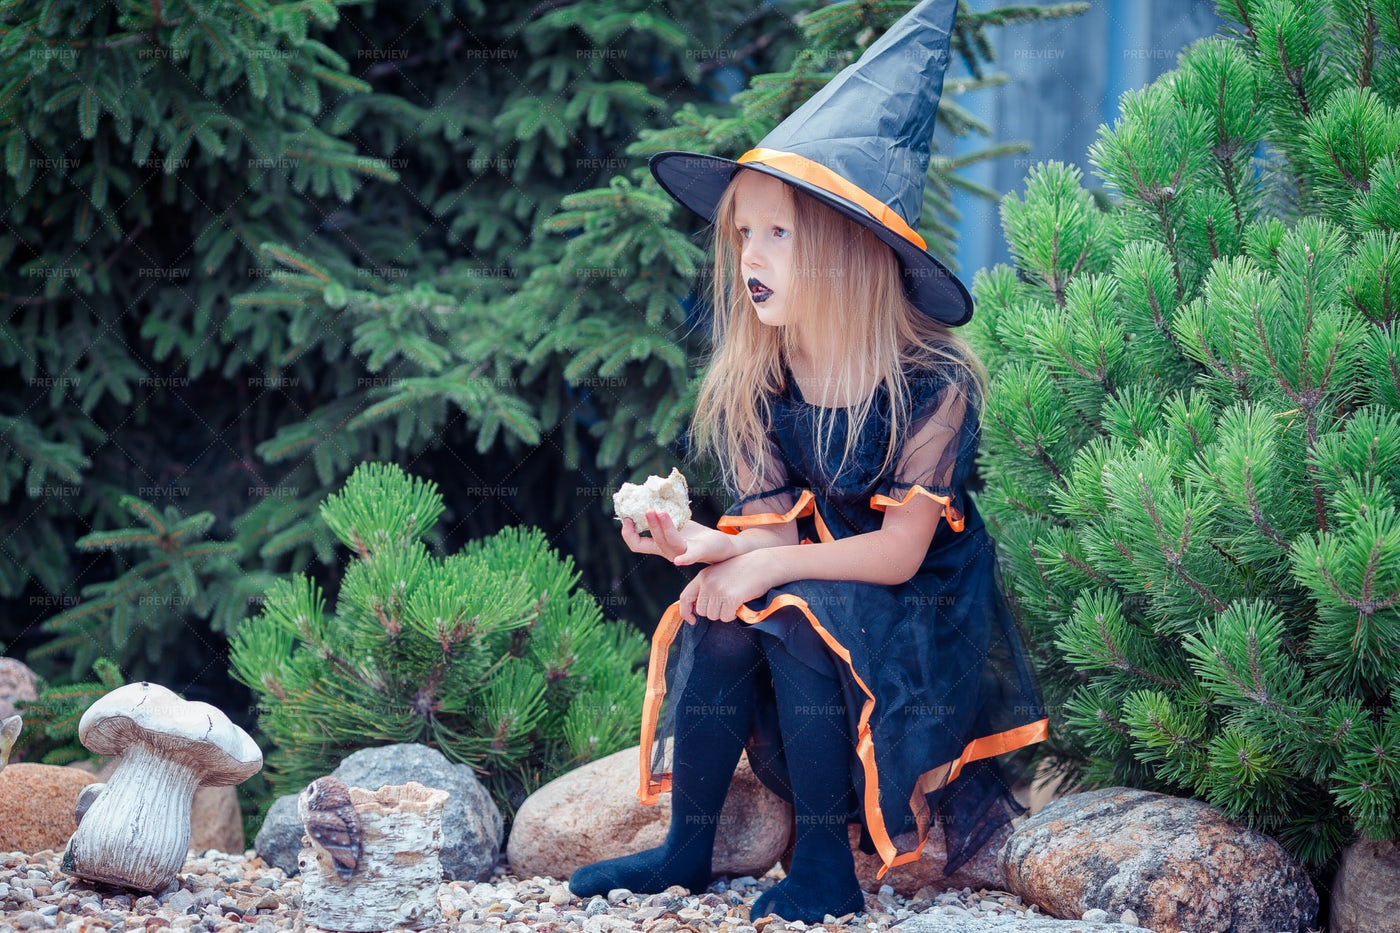 Little Girl In Halloween Costume: Stock Photos